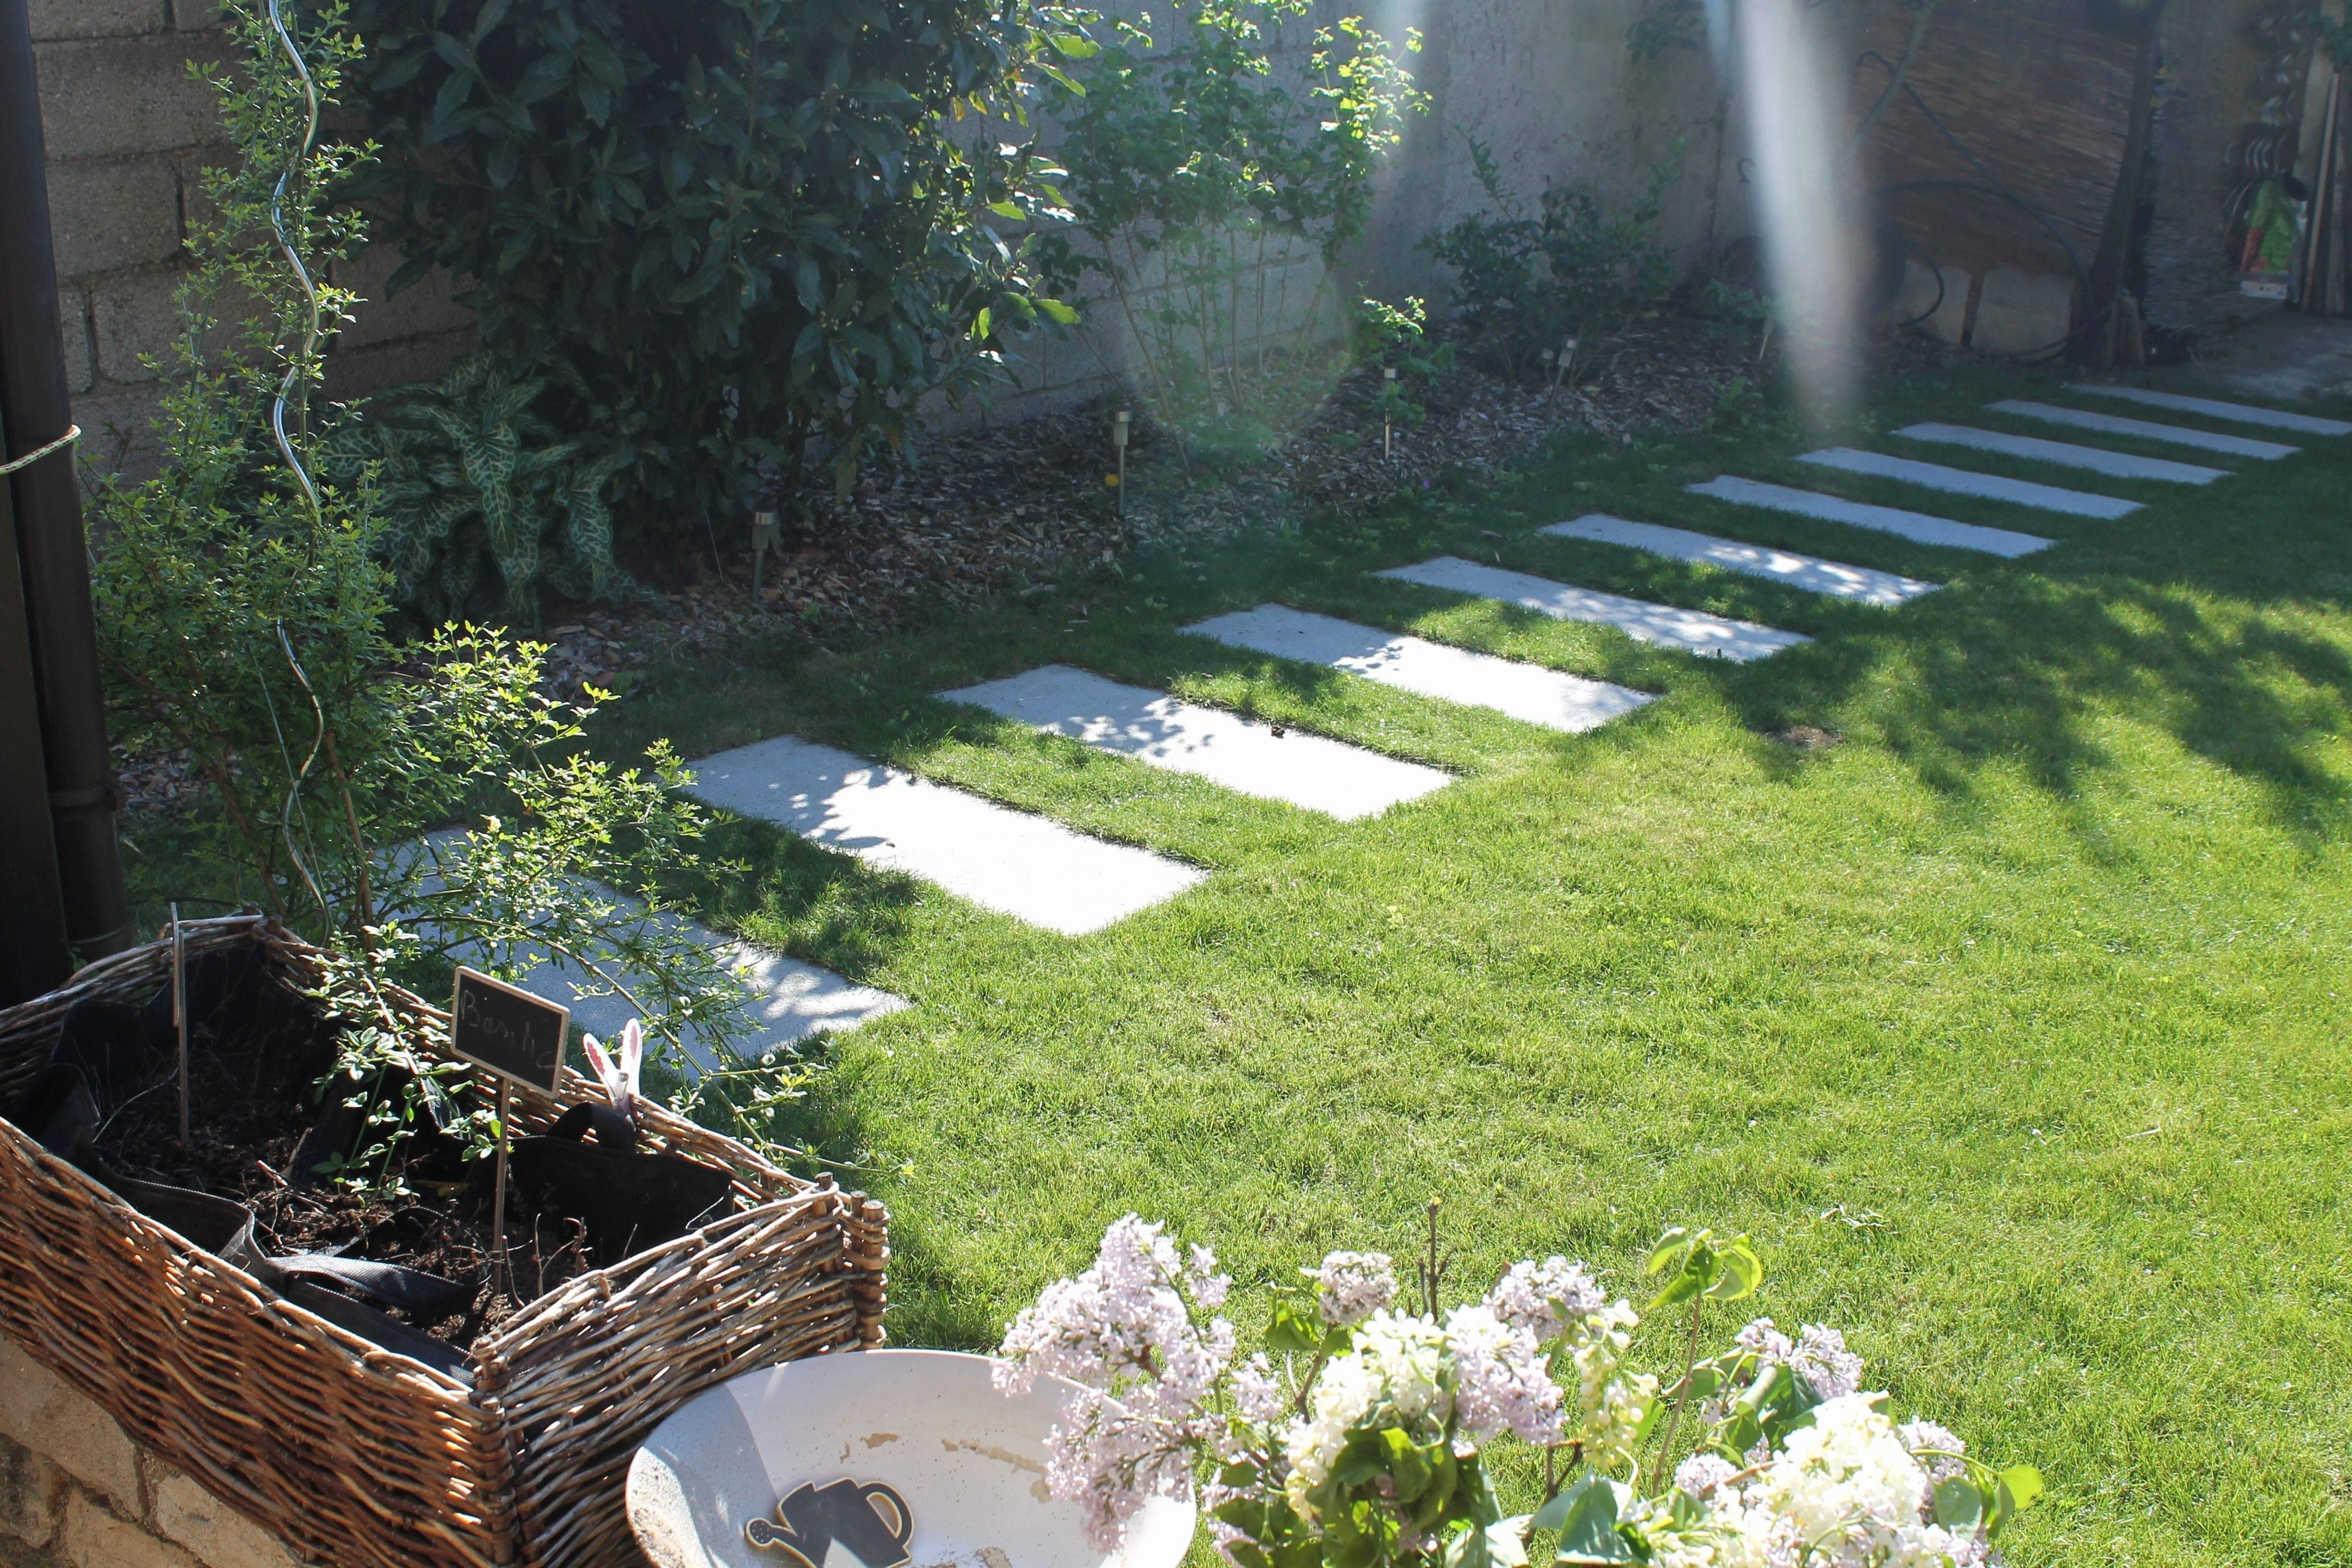 Jardin Japonais Minecraft Nouveau Galerie Jardin Japonais En Pente Greenwashing Home Design Ideen Und